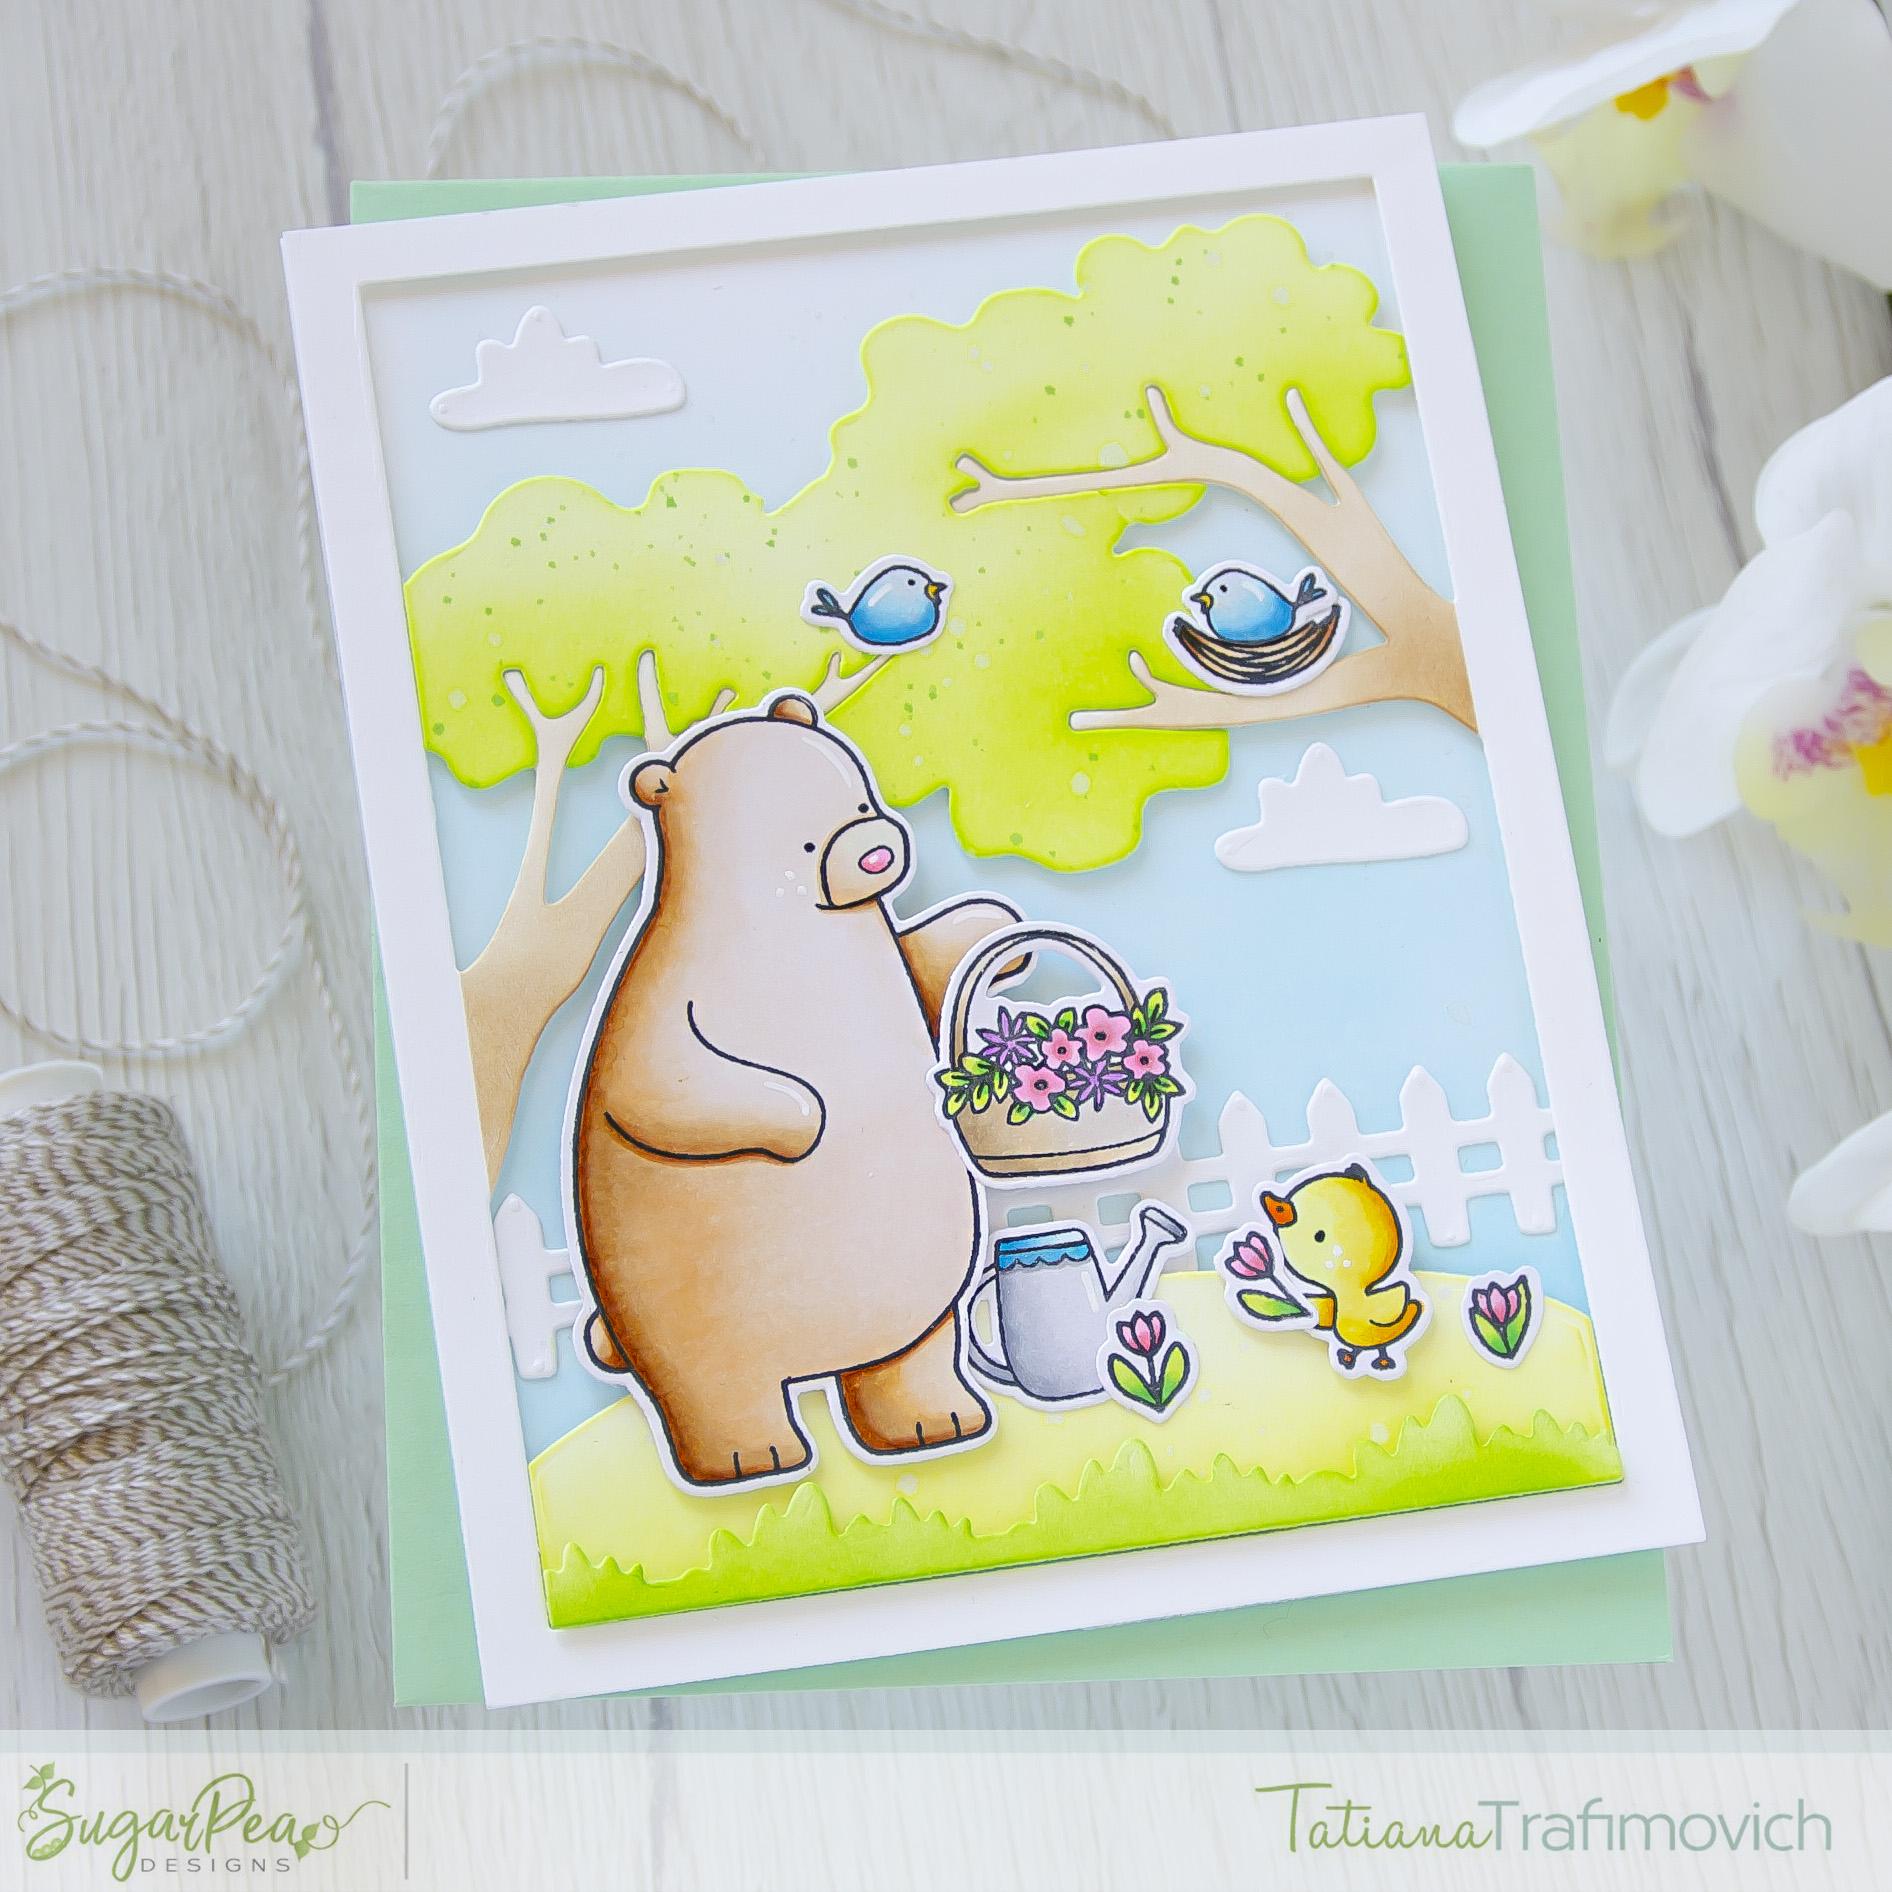 Hey Spring #handmade card by Tatiana Trafimovich #tatianacraftandart - Hey Spring stamp set by SugarPea Designs #sugarpeadesigns